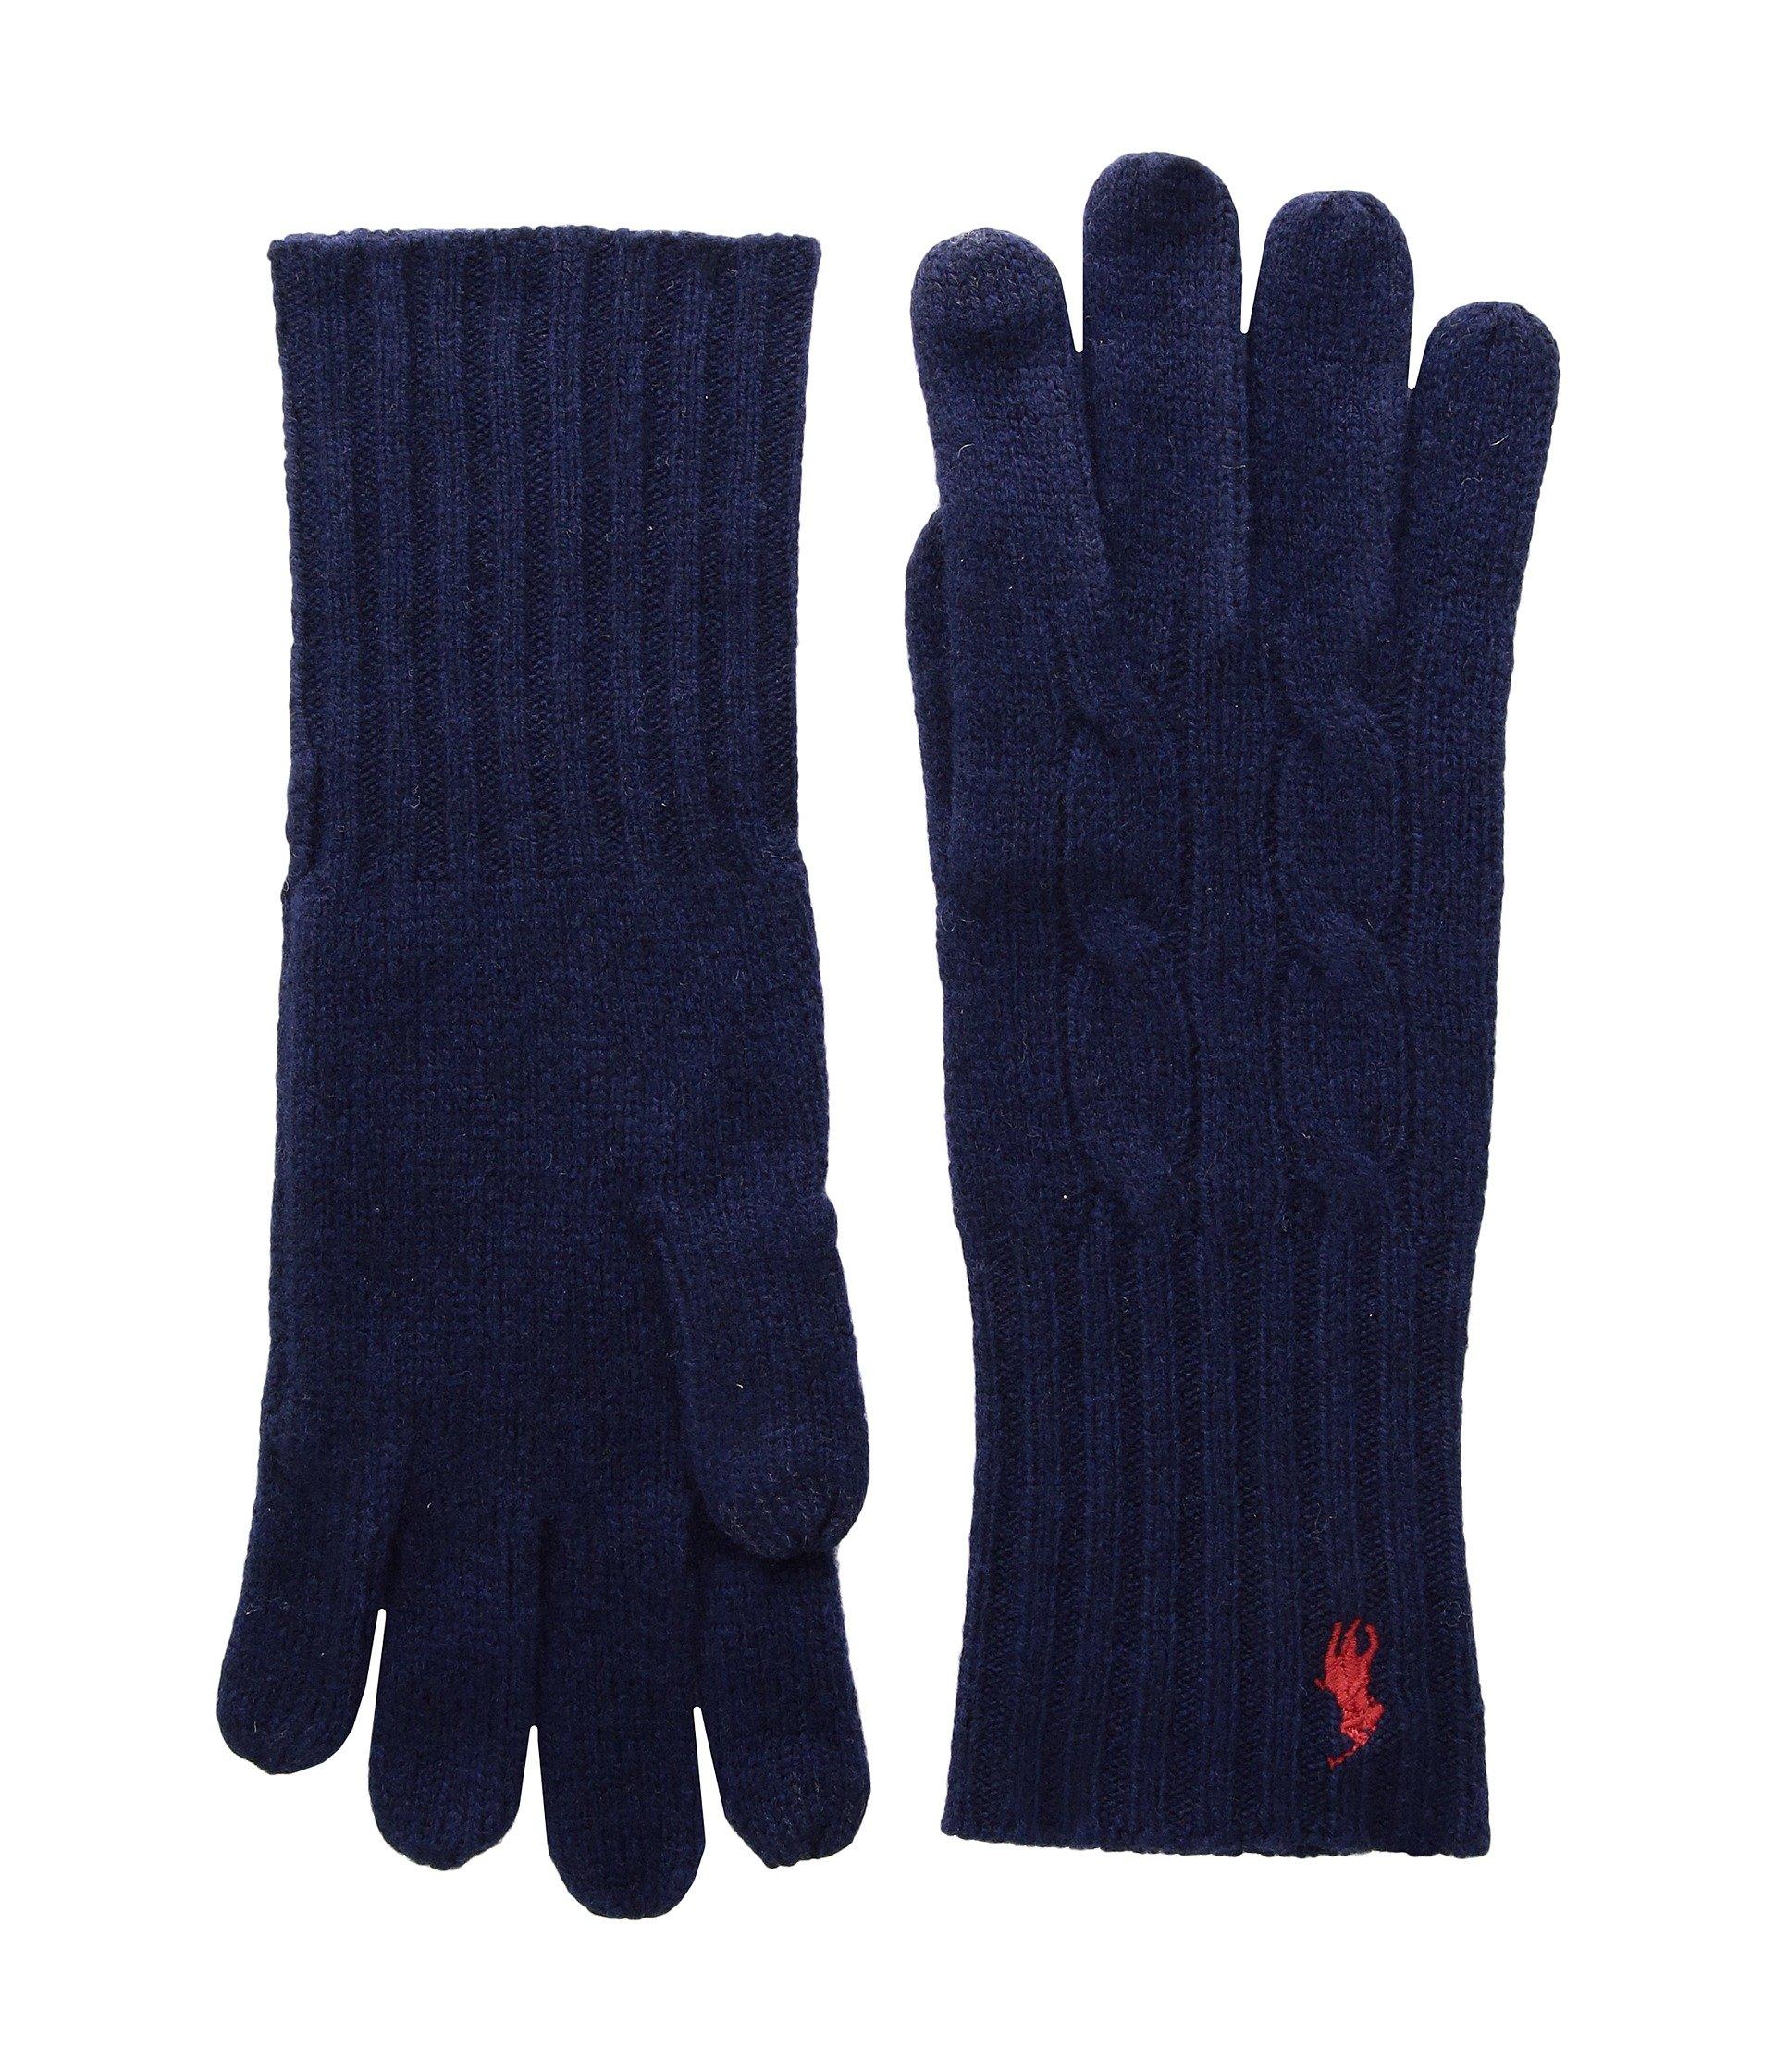 Guantes para Mujer Polo Ralph Lauren Cashmere Blend Classic Cable Knit Gloves  + Polo Ralph Lauren en VeoyCompro.net